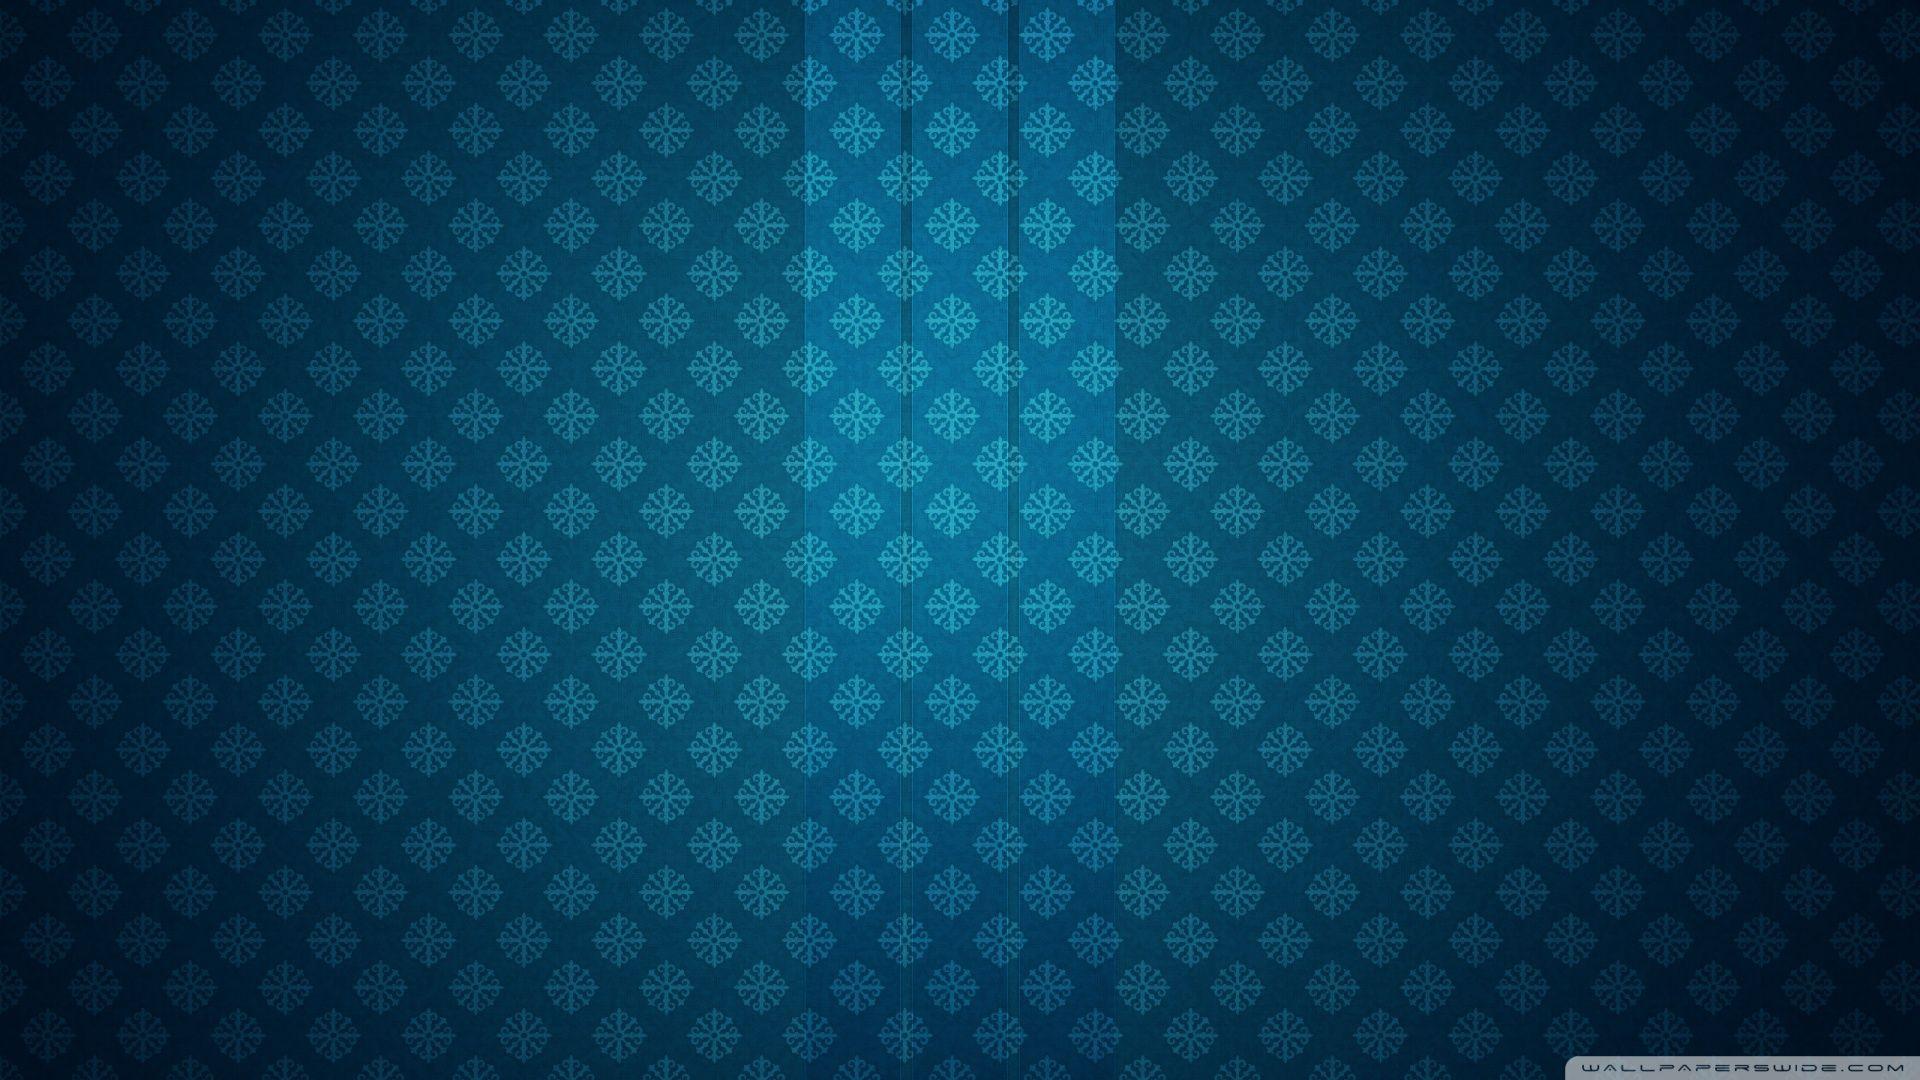 Islamic Design Wallpapers - Top Free Islamic Design